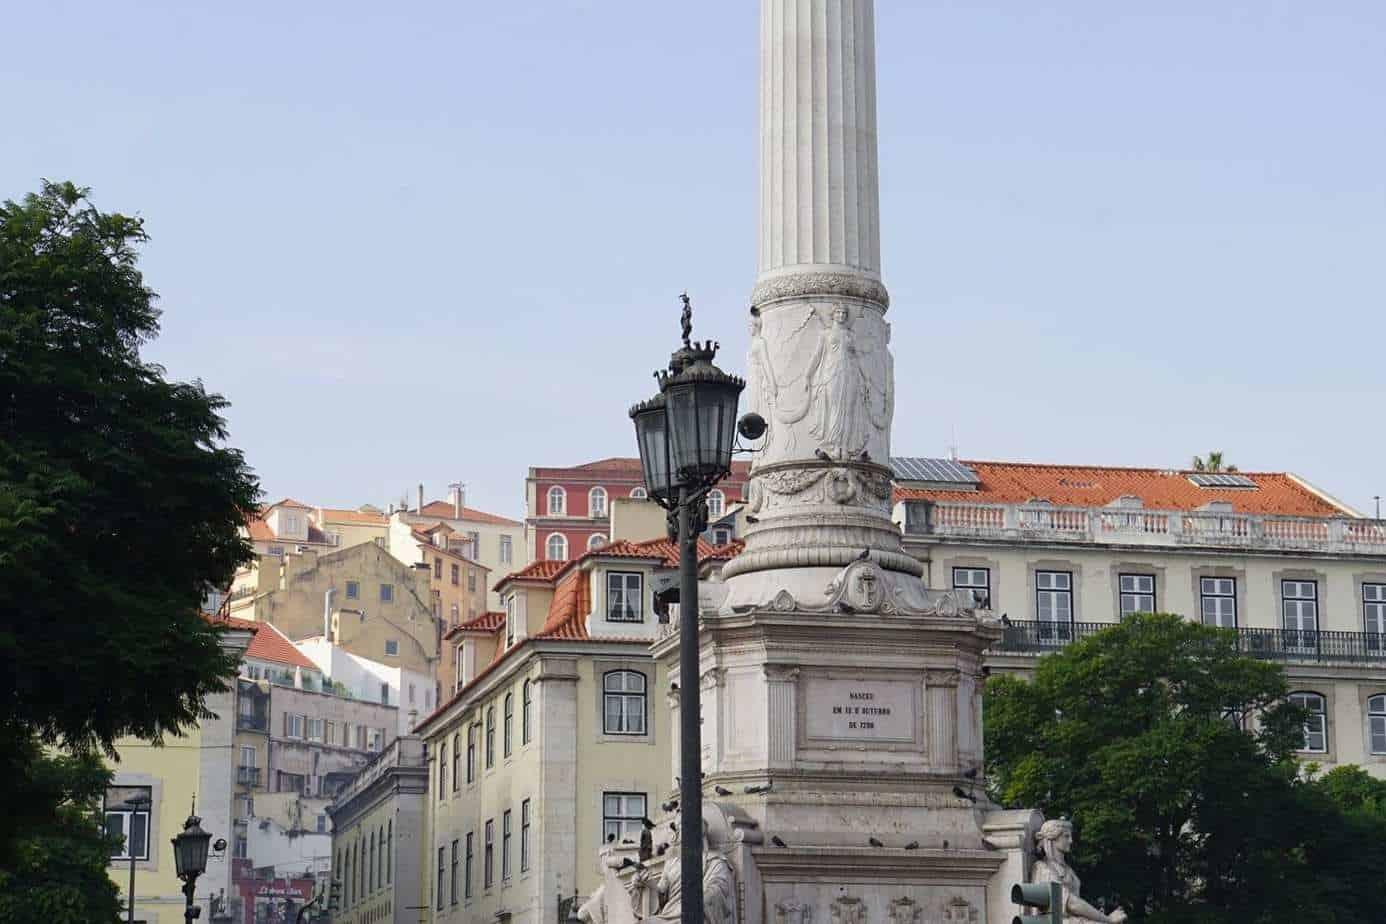 ExploreTraveler Presents: Exploring Lisbon Portugal Part 1 - A small clock tower in front of a building - Lisbon